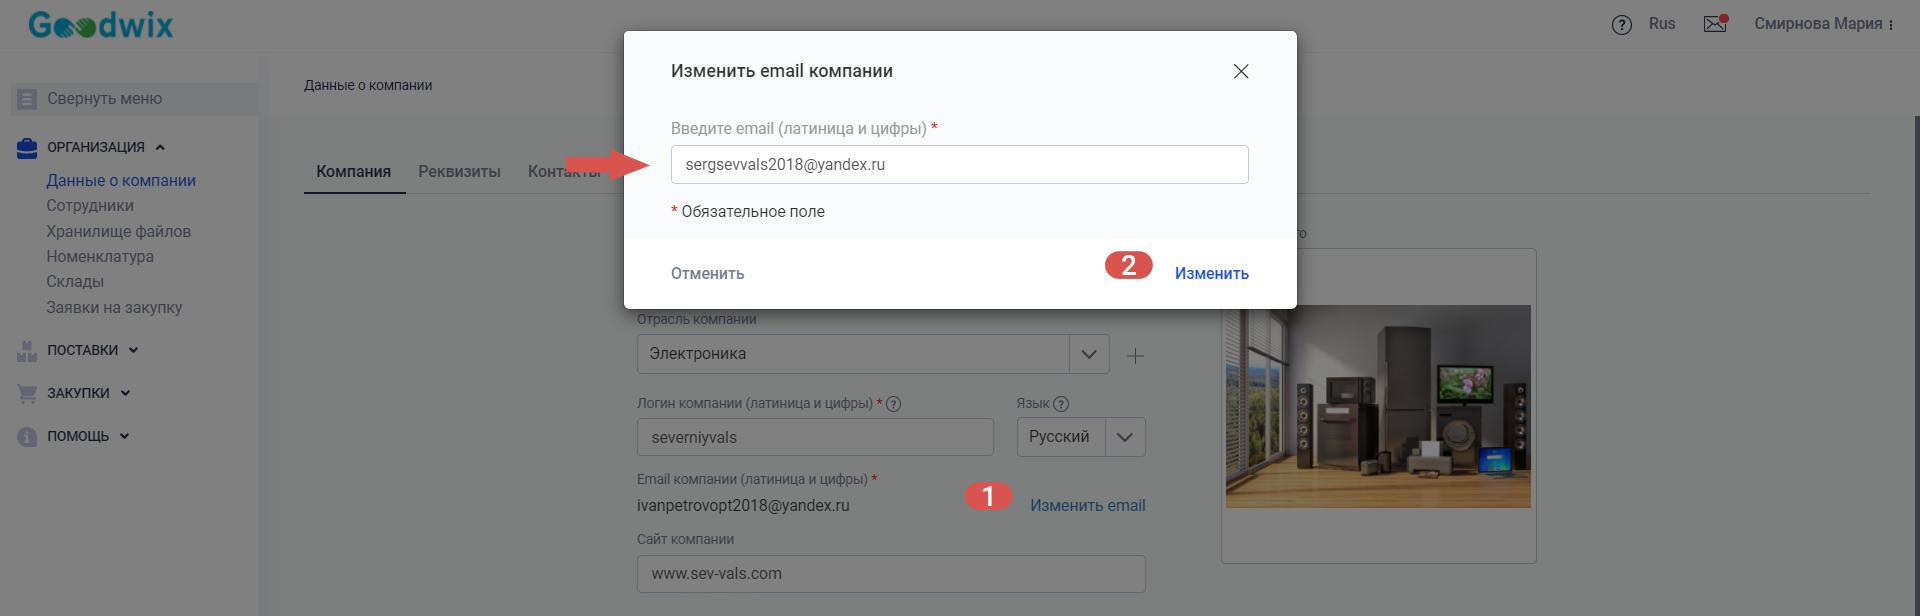 Смена общего e-mail организации_Руководство по работе с профилем